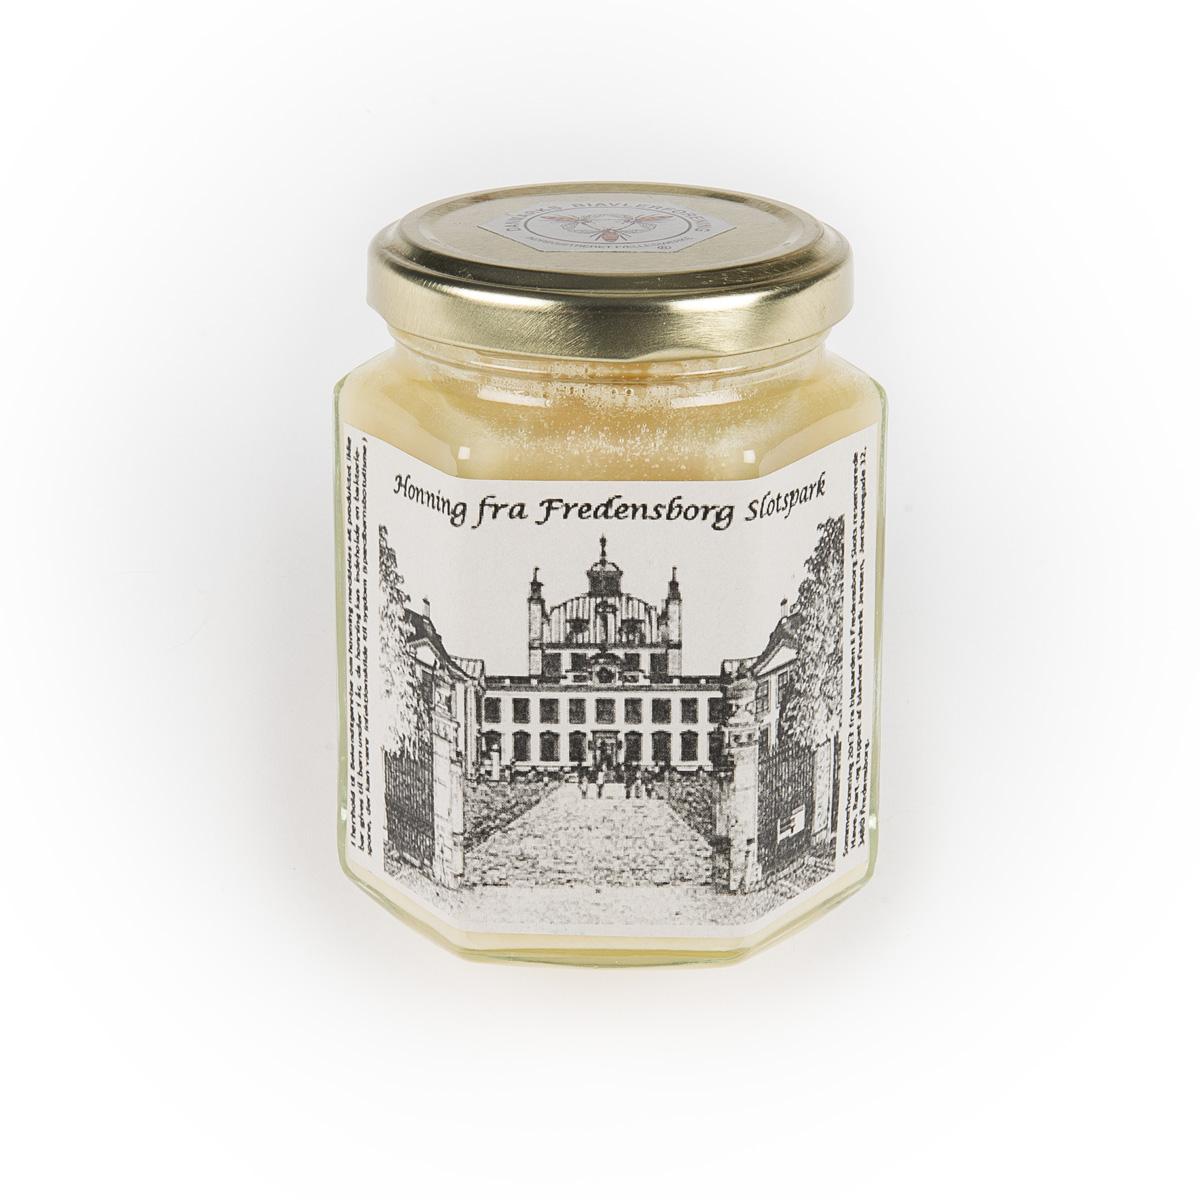 Fredensborg honning